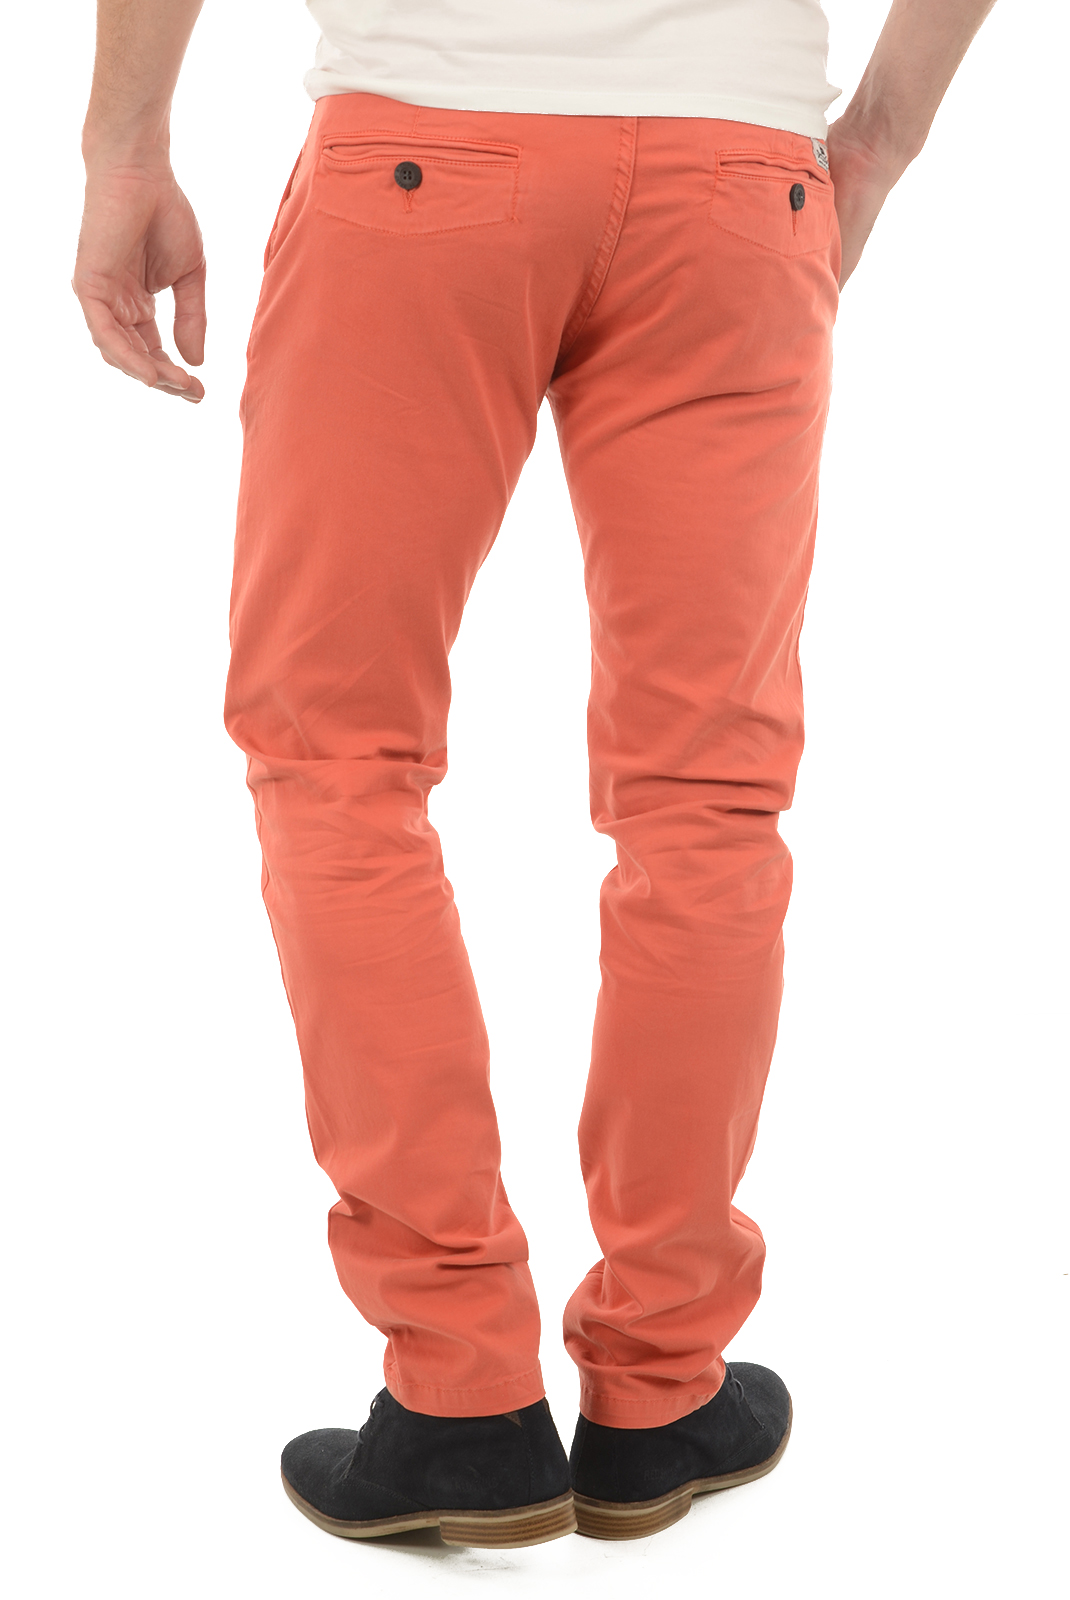 Pantalons chino/citadin  Deeluxe LAWSON TOMATO